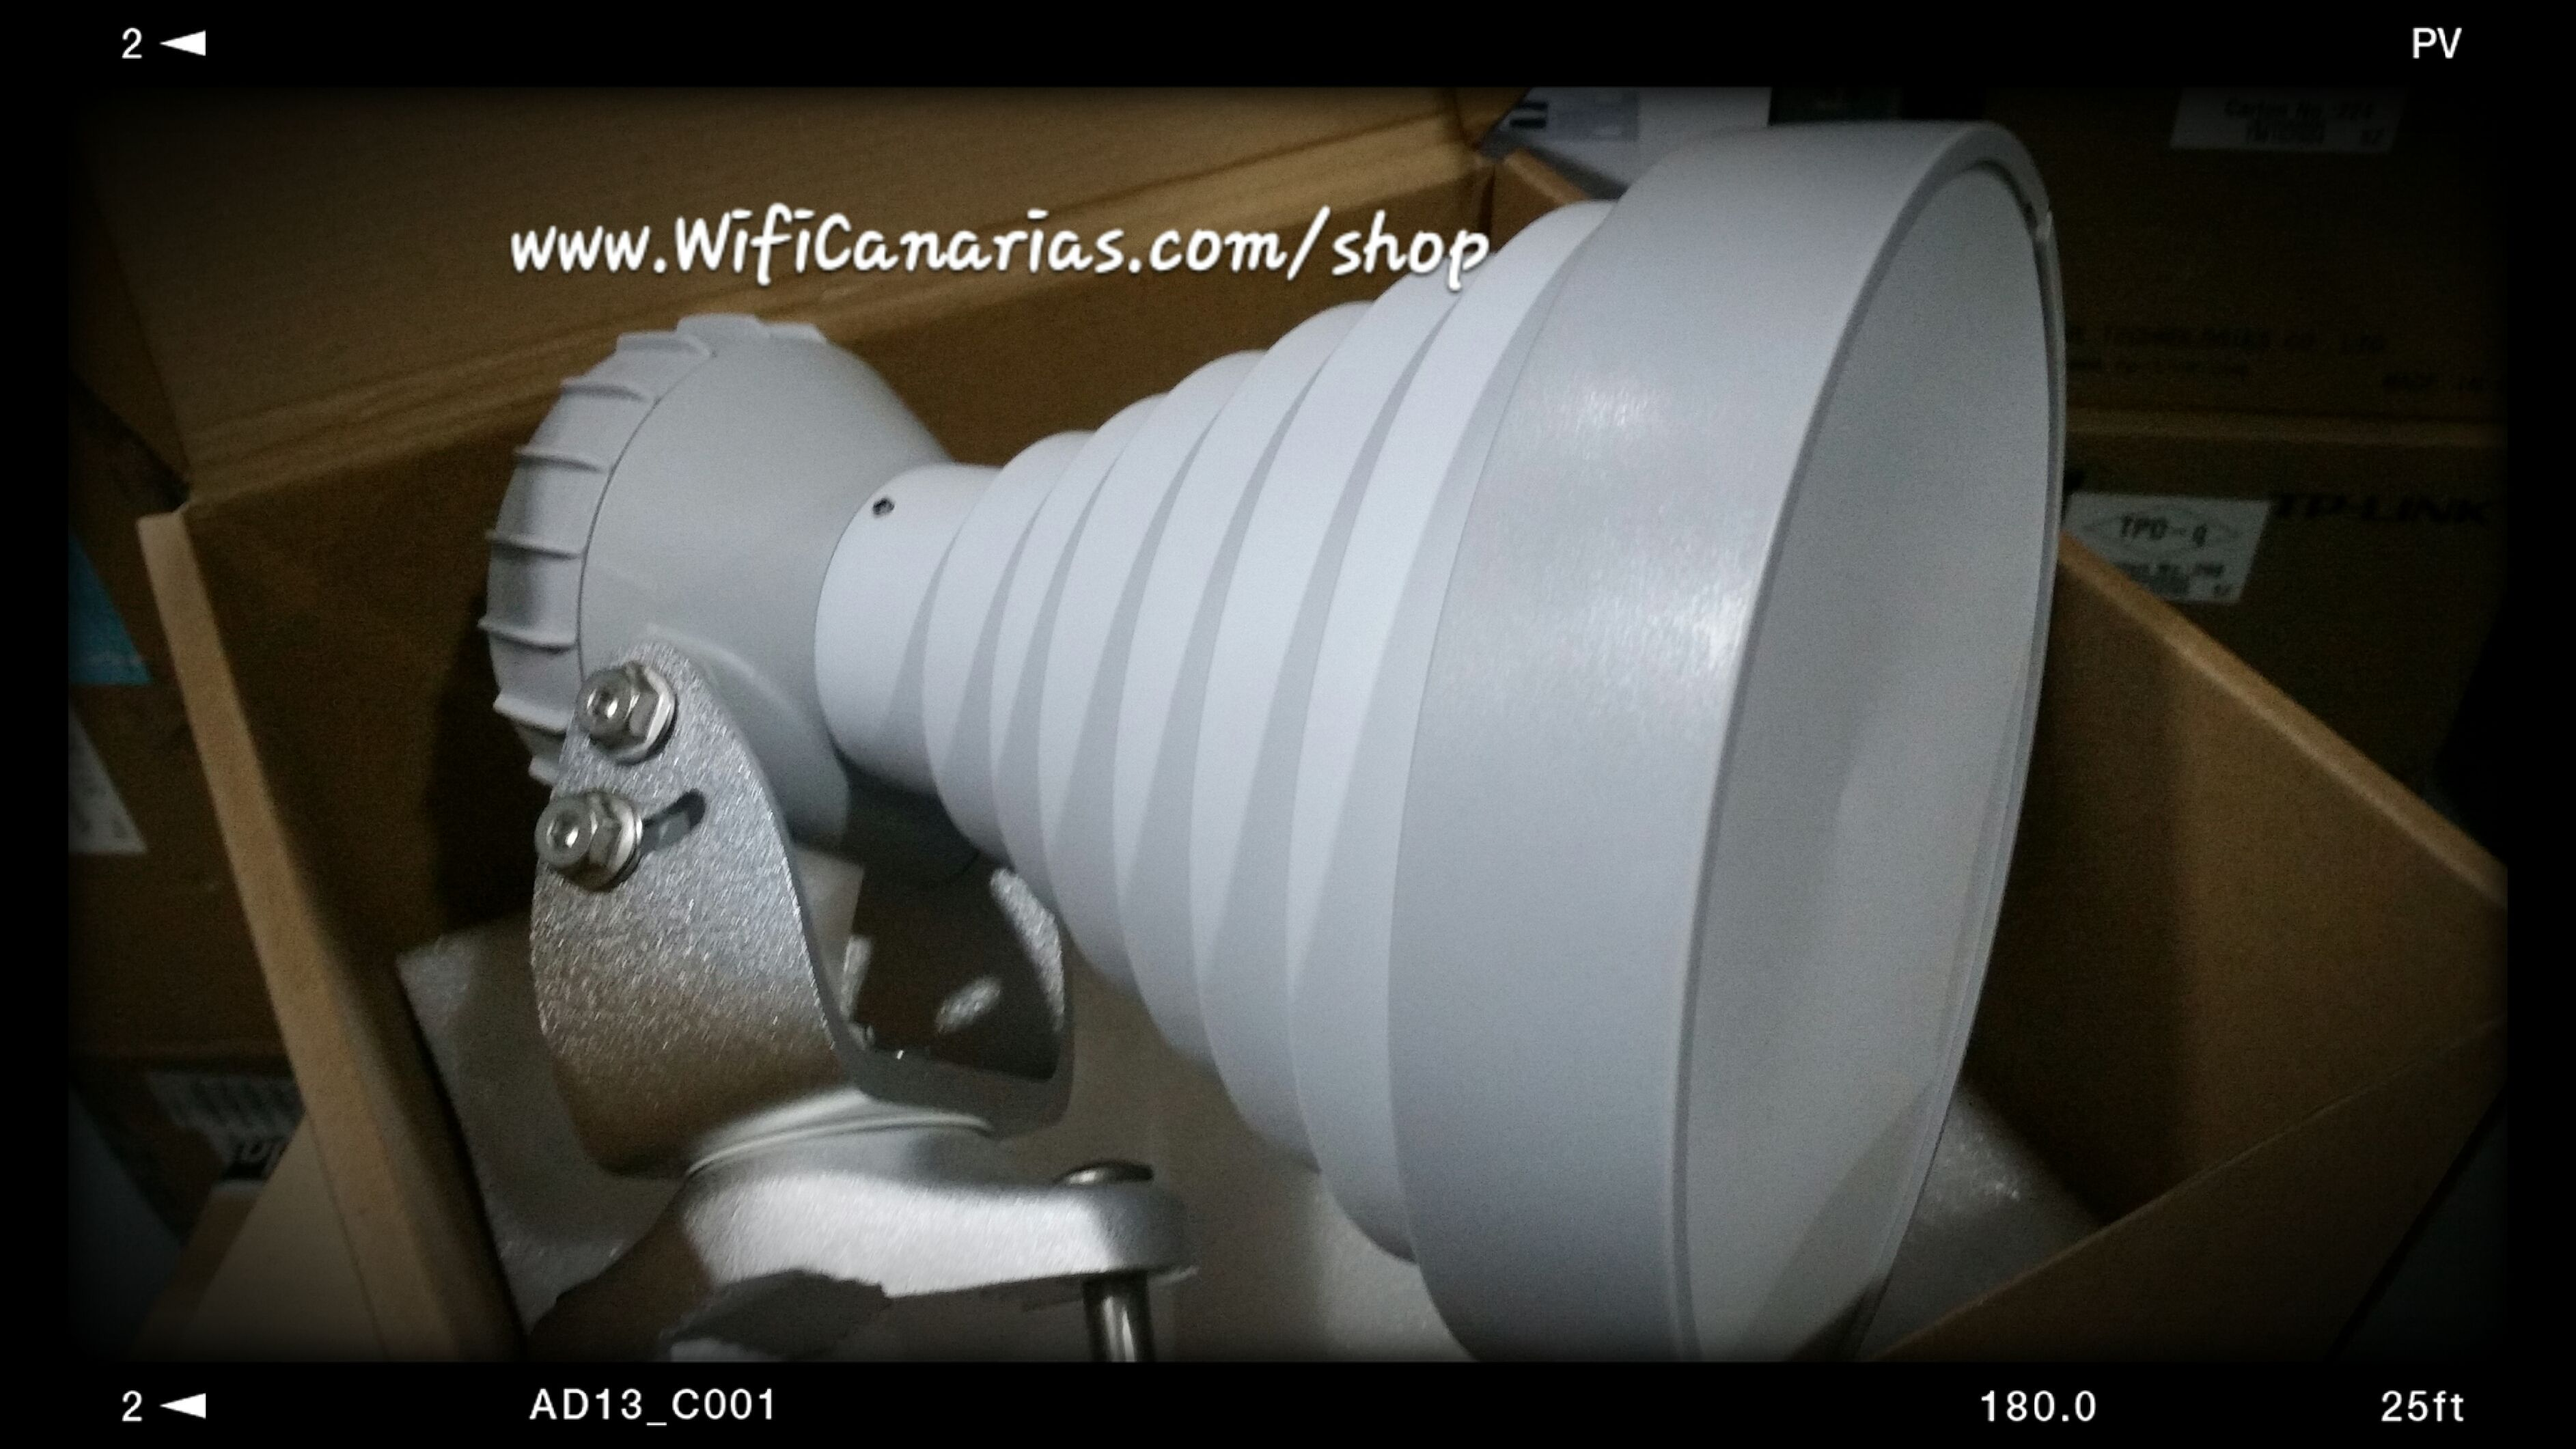 Ya disponible el SIMPER de RF elements...  cómpralo antes de que desaparezcan... http://www.wificanarias.com/shop/wireless-exterior/438-rf-elements-sector-bocina-simetrica-sh-tp-5-ghz-30-grados-18-dbi.html #RFElements #SIMPER